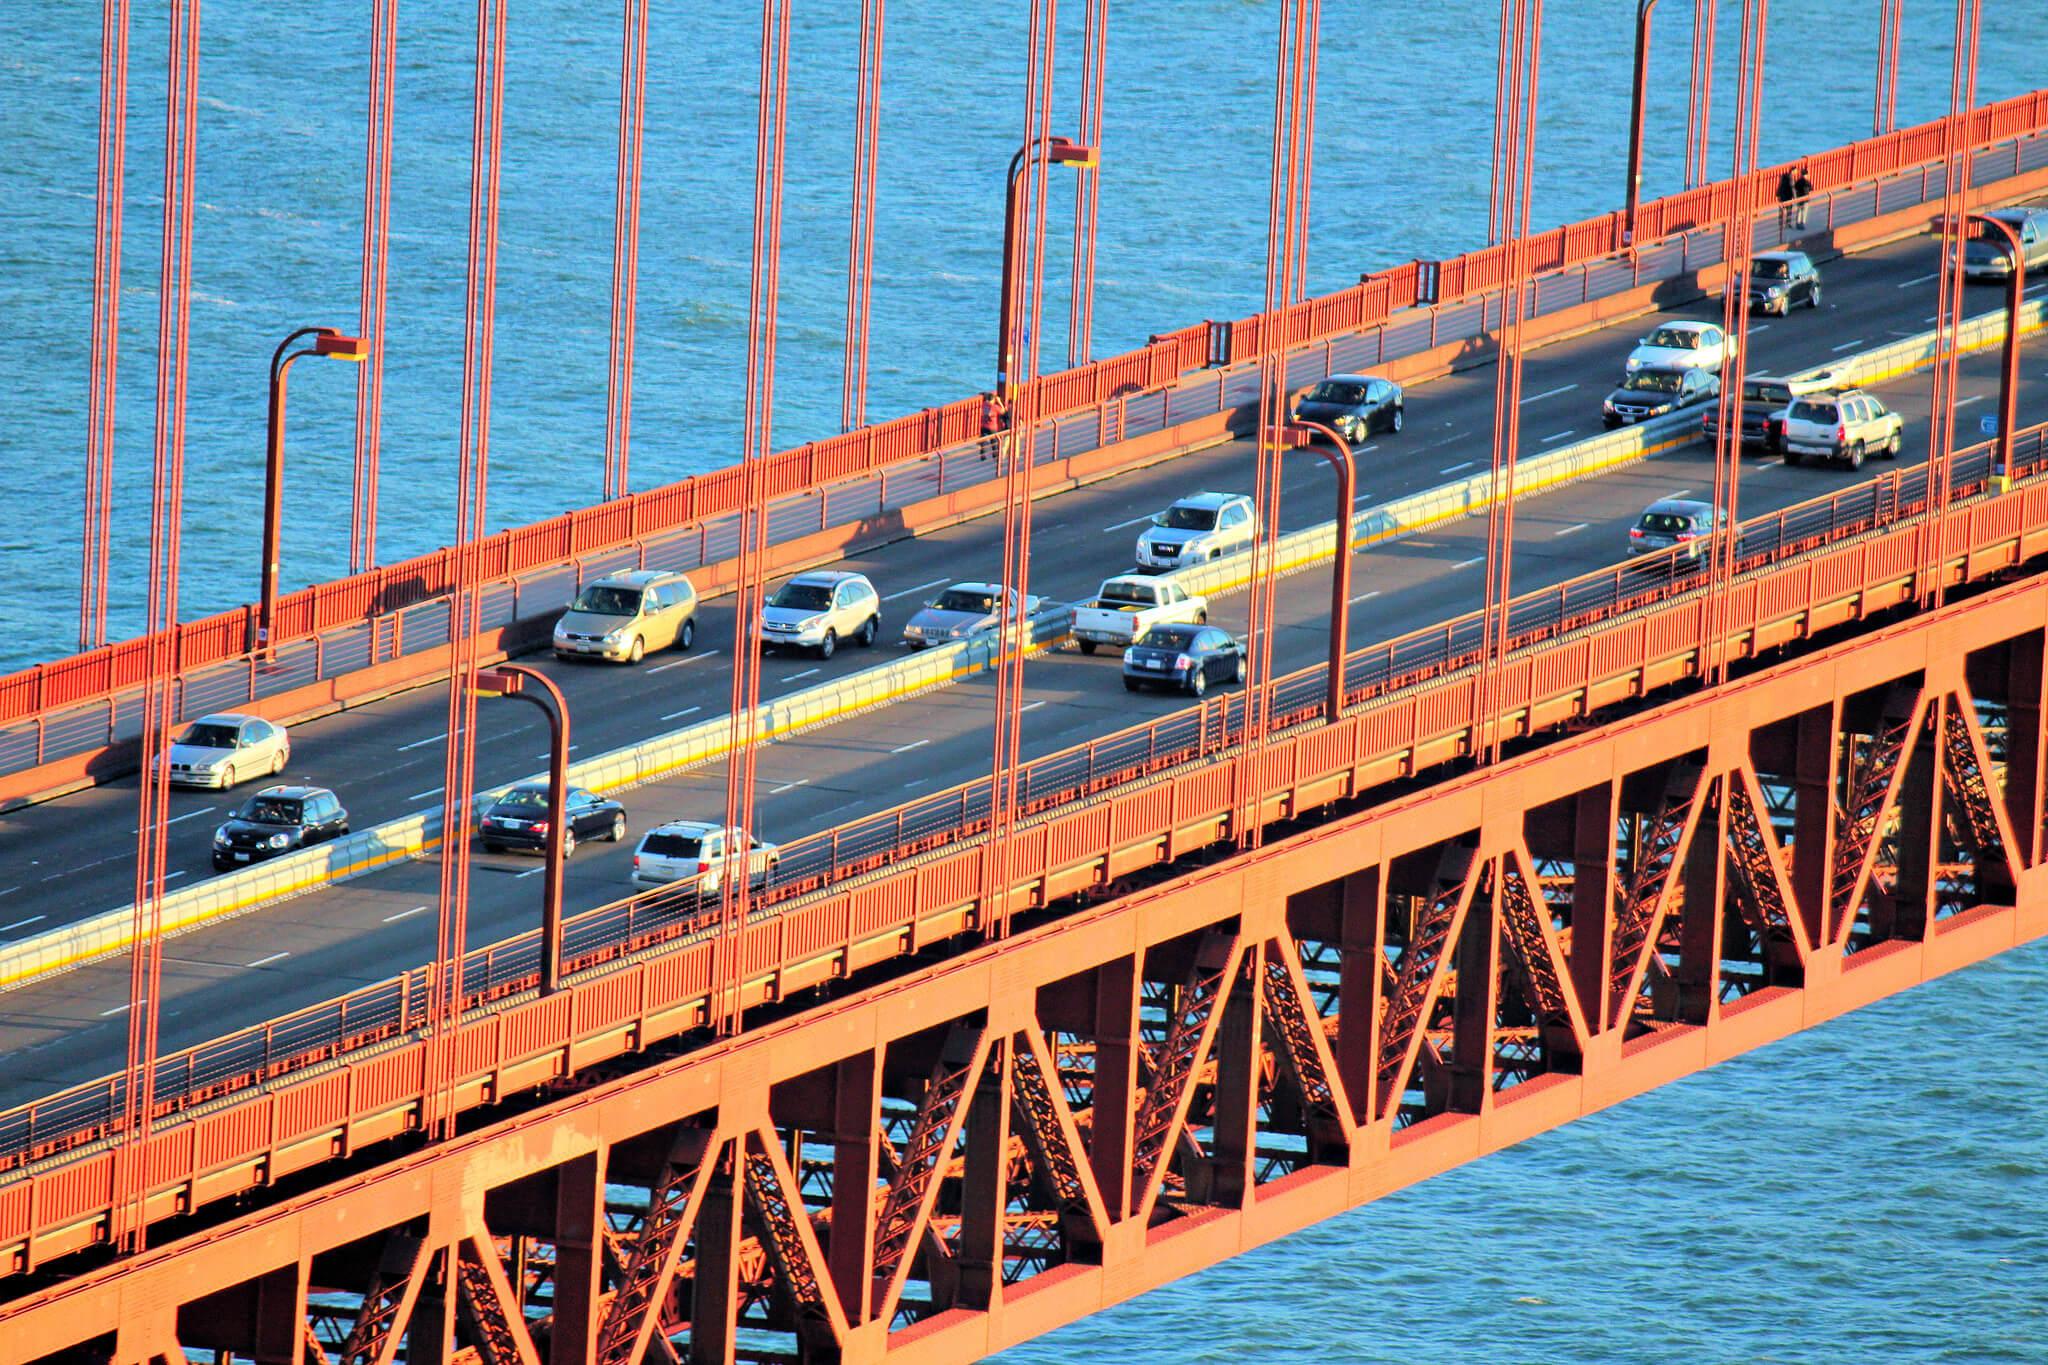 Golden Gate Bridge lanes